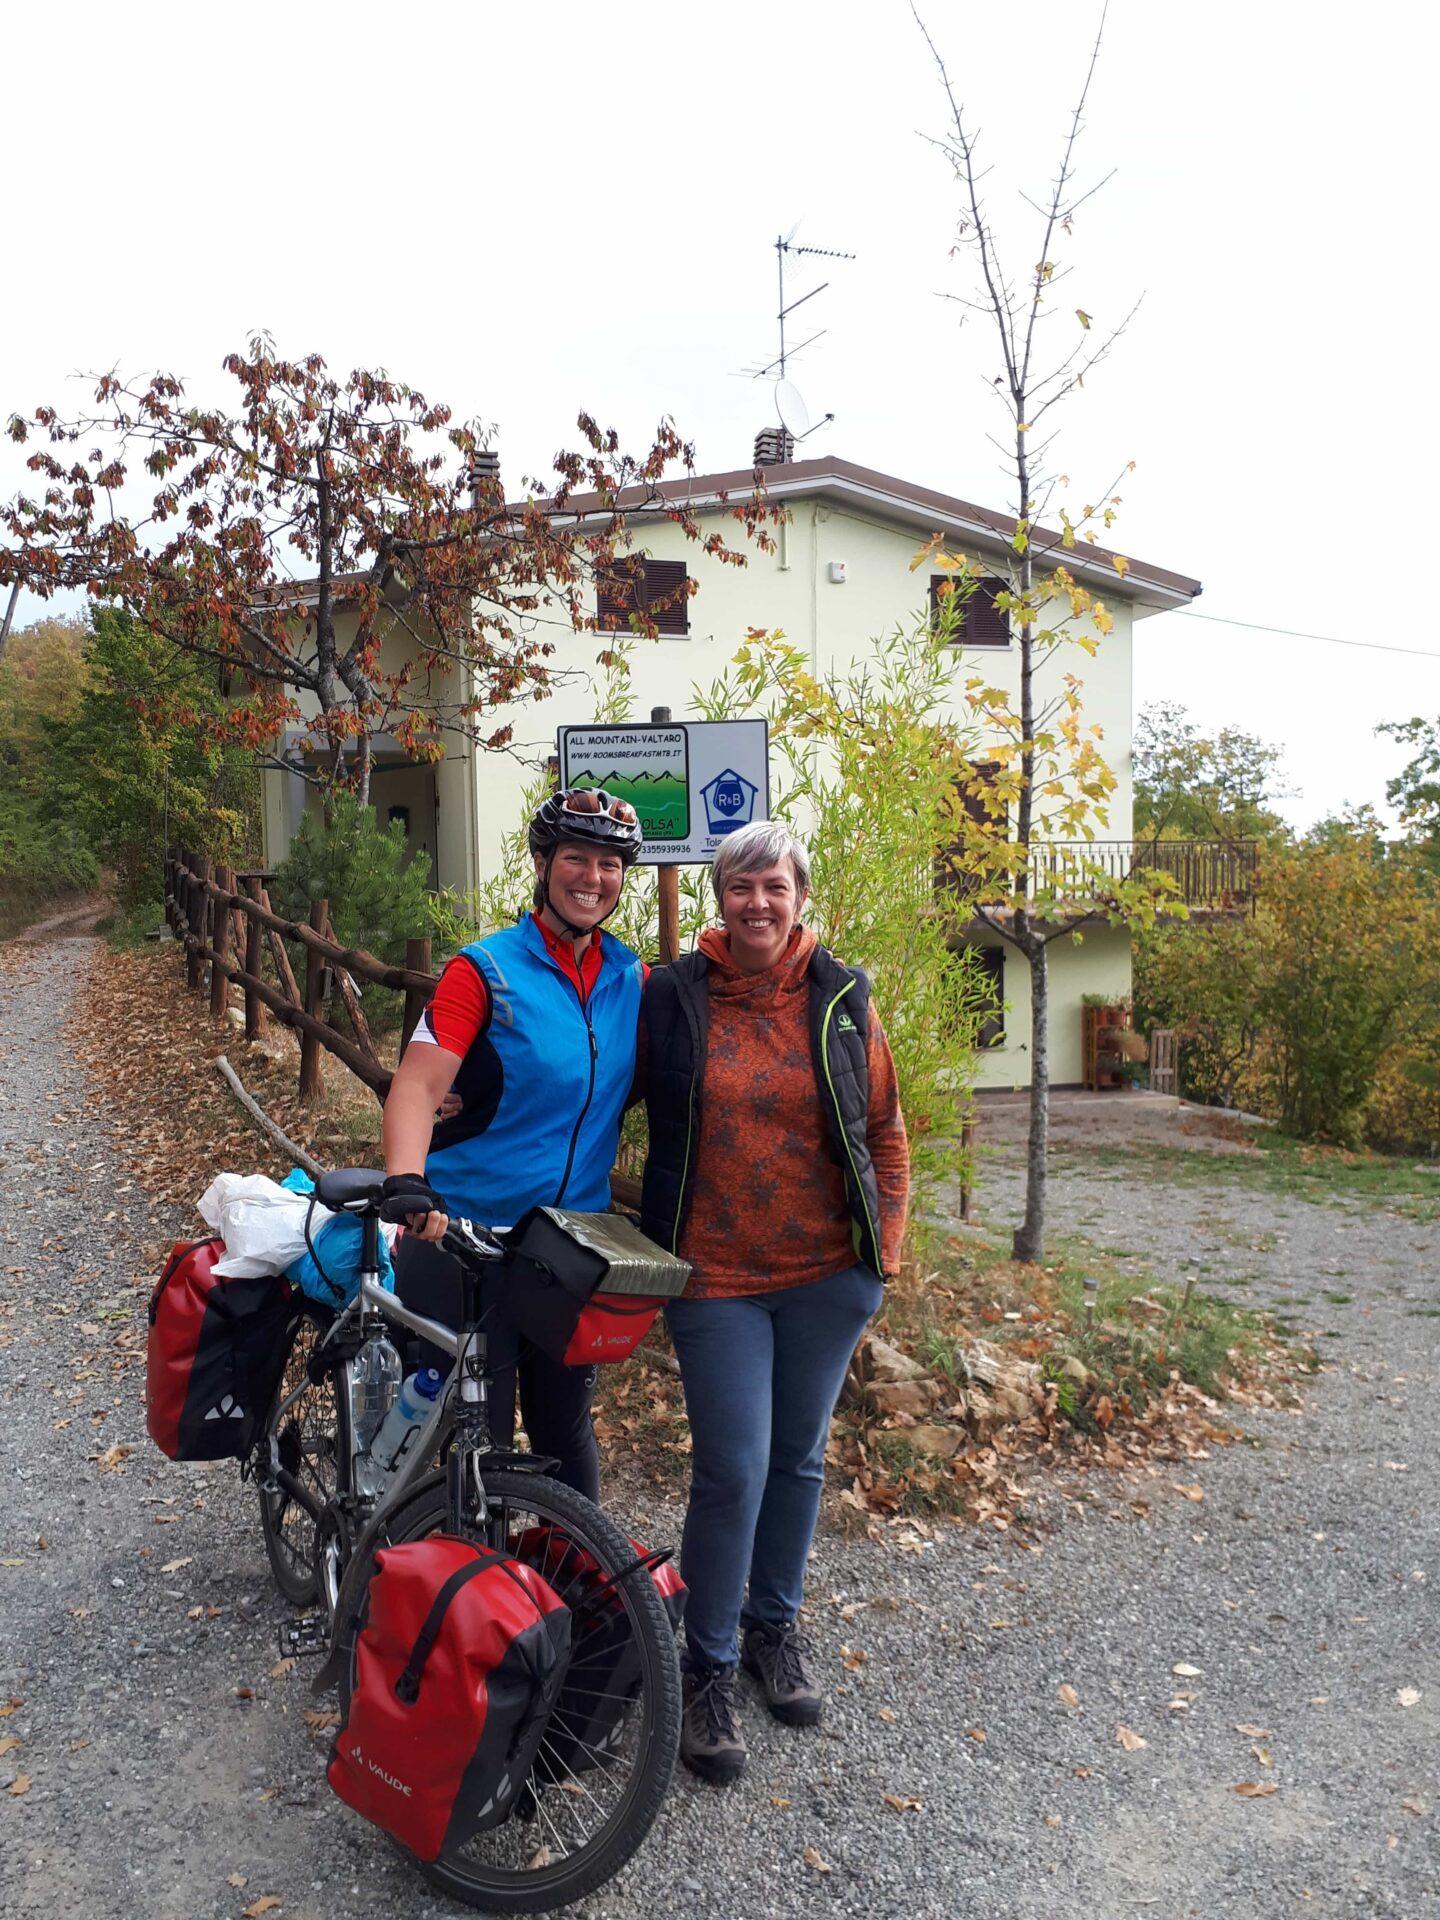 Tolasudolsa_Bike friendly